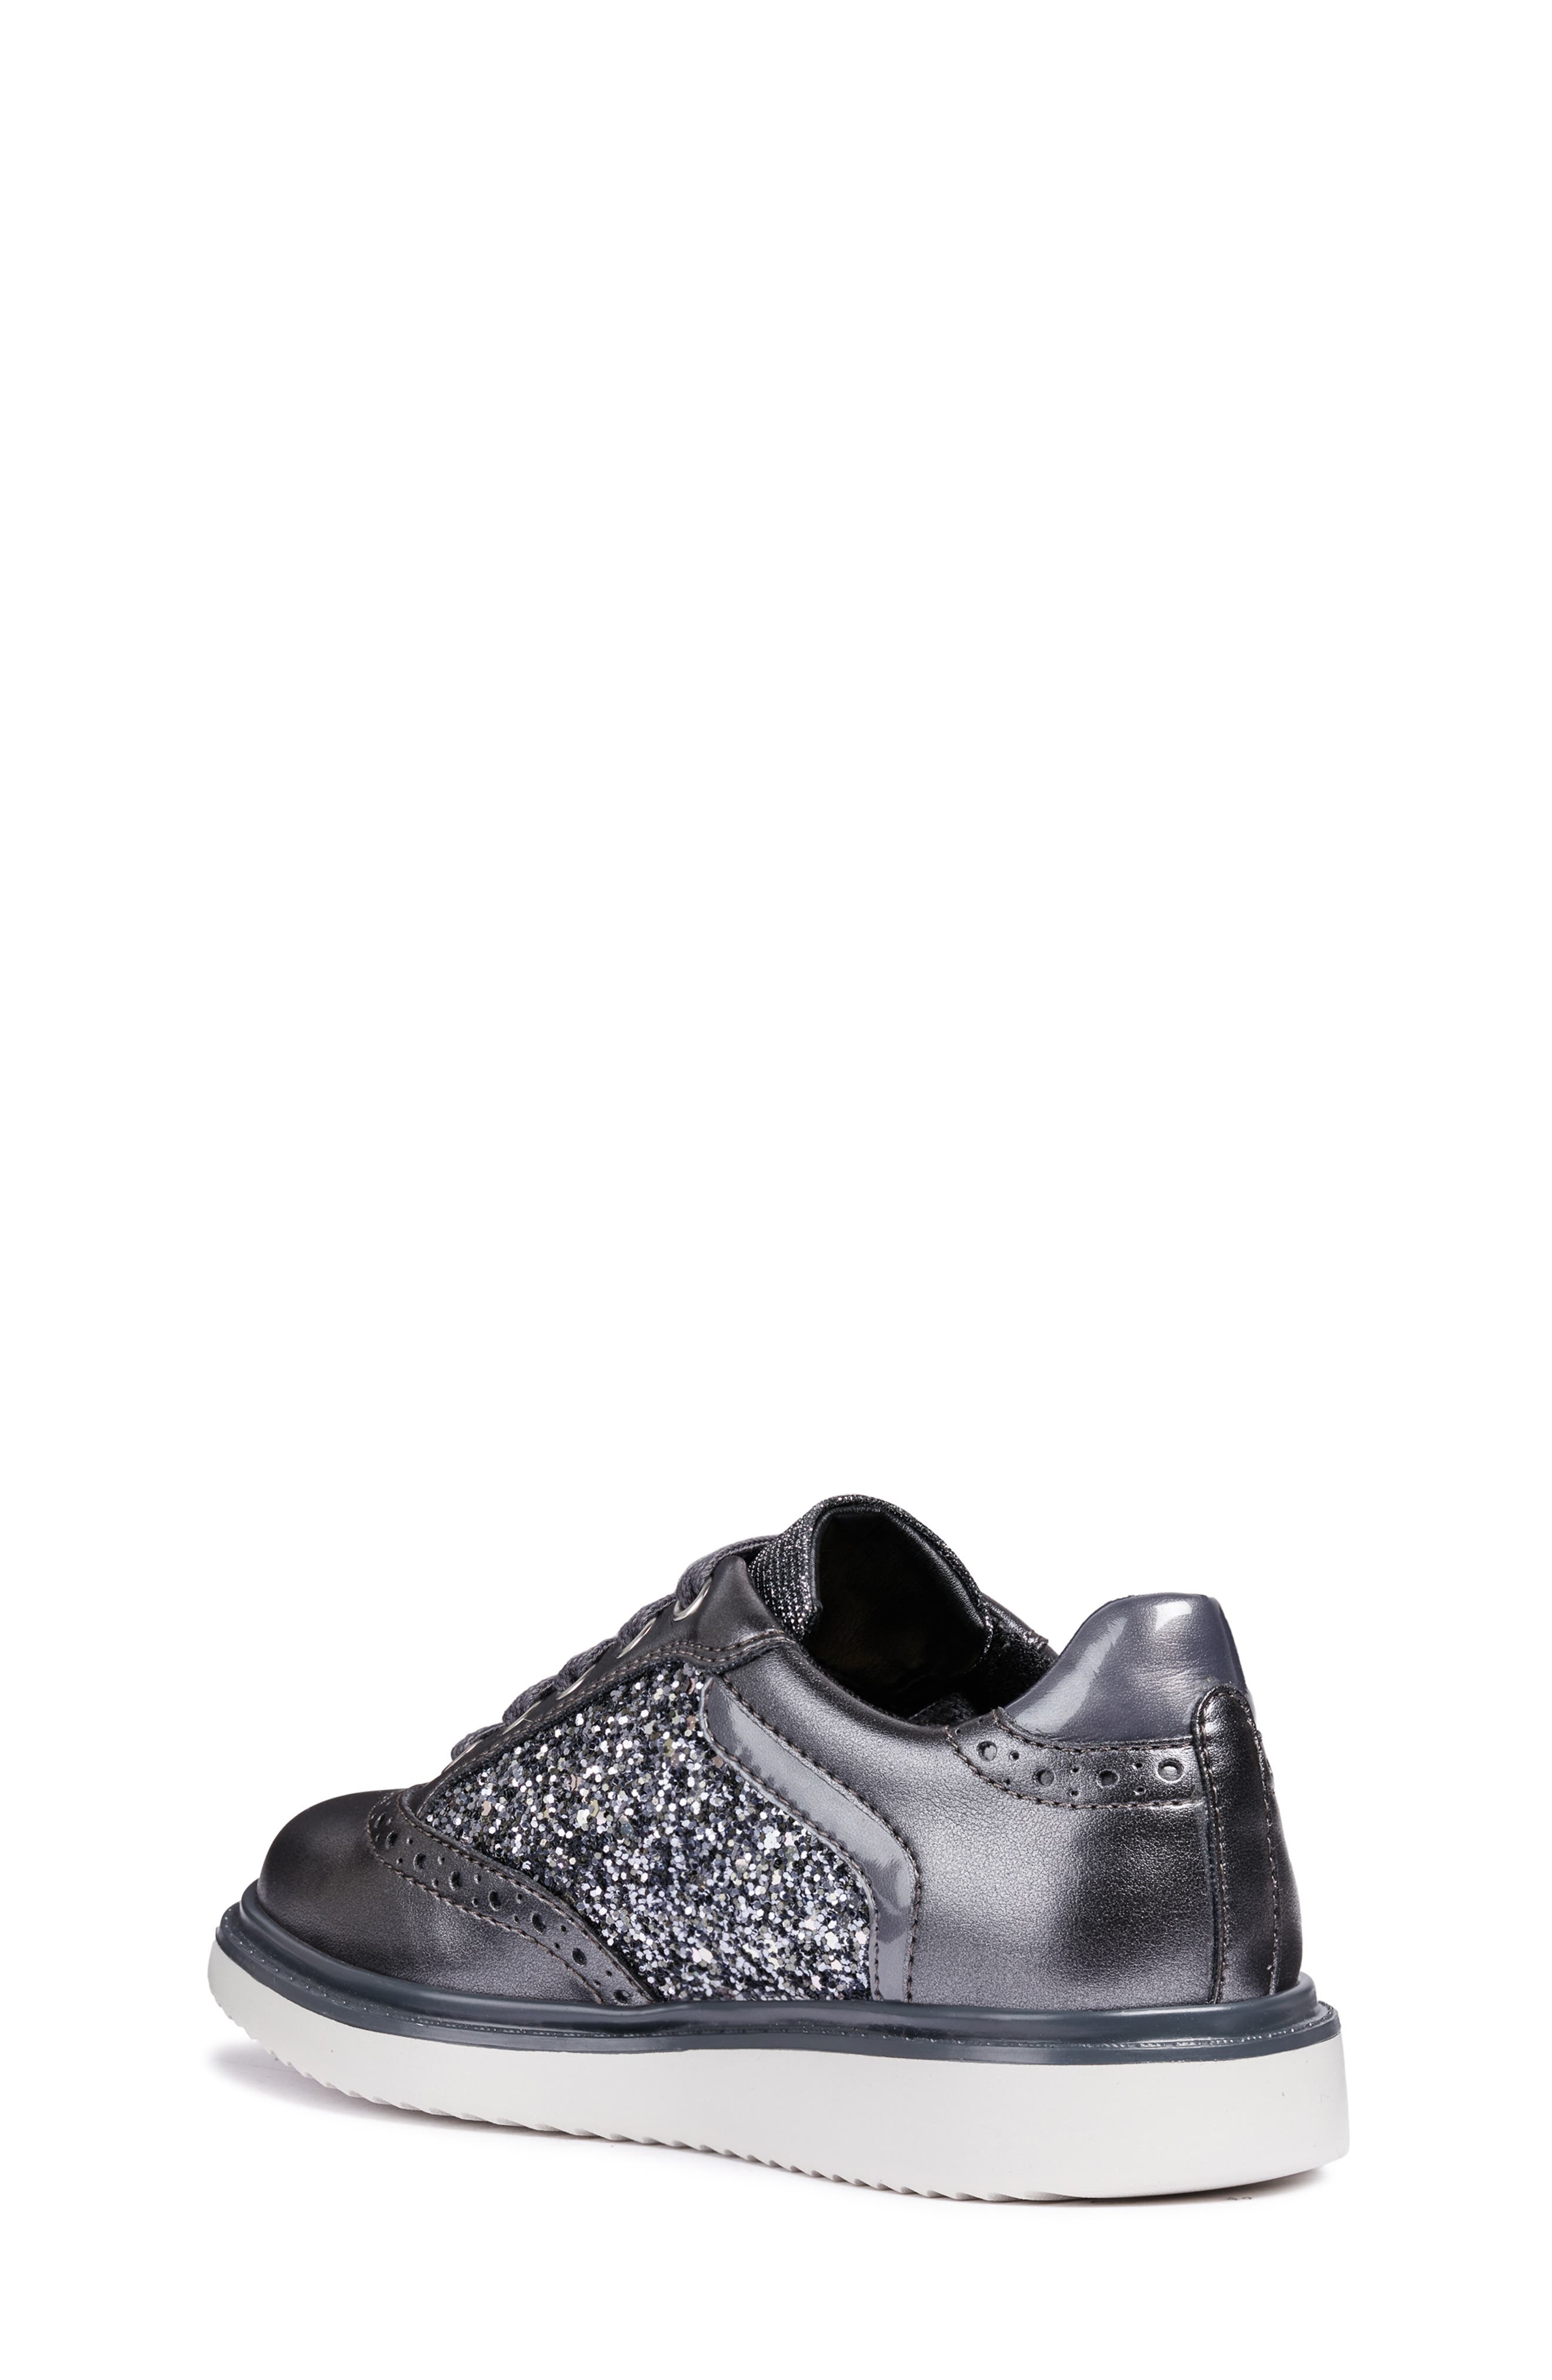 Thymar Sparkle Sneaker,                             Alternate thumbnail 2, color,                             DARK SILVER